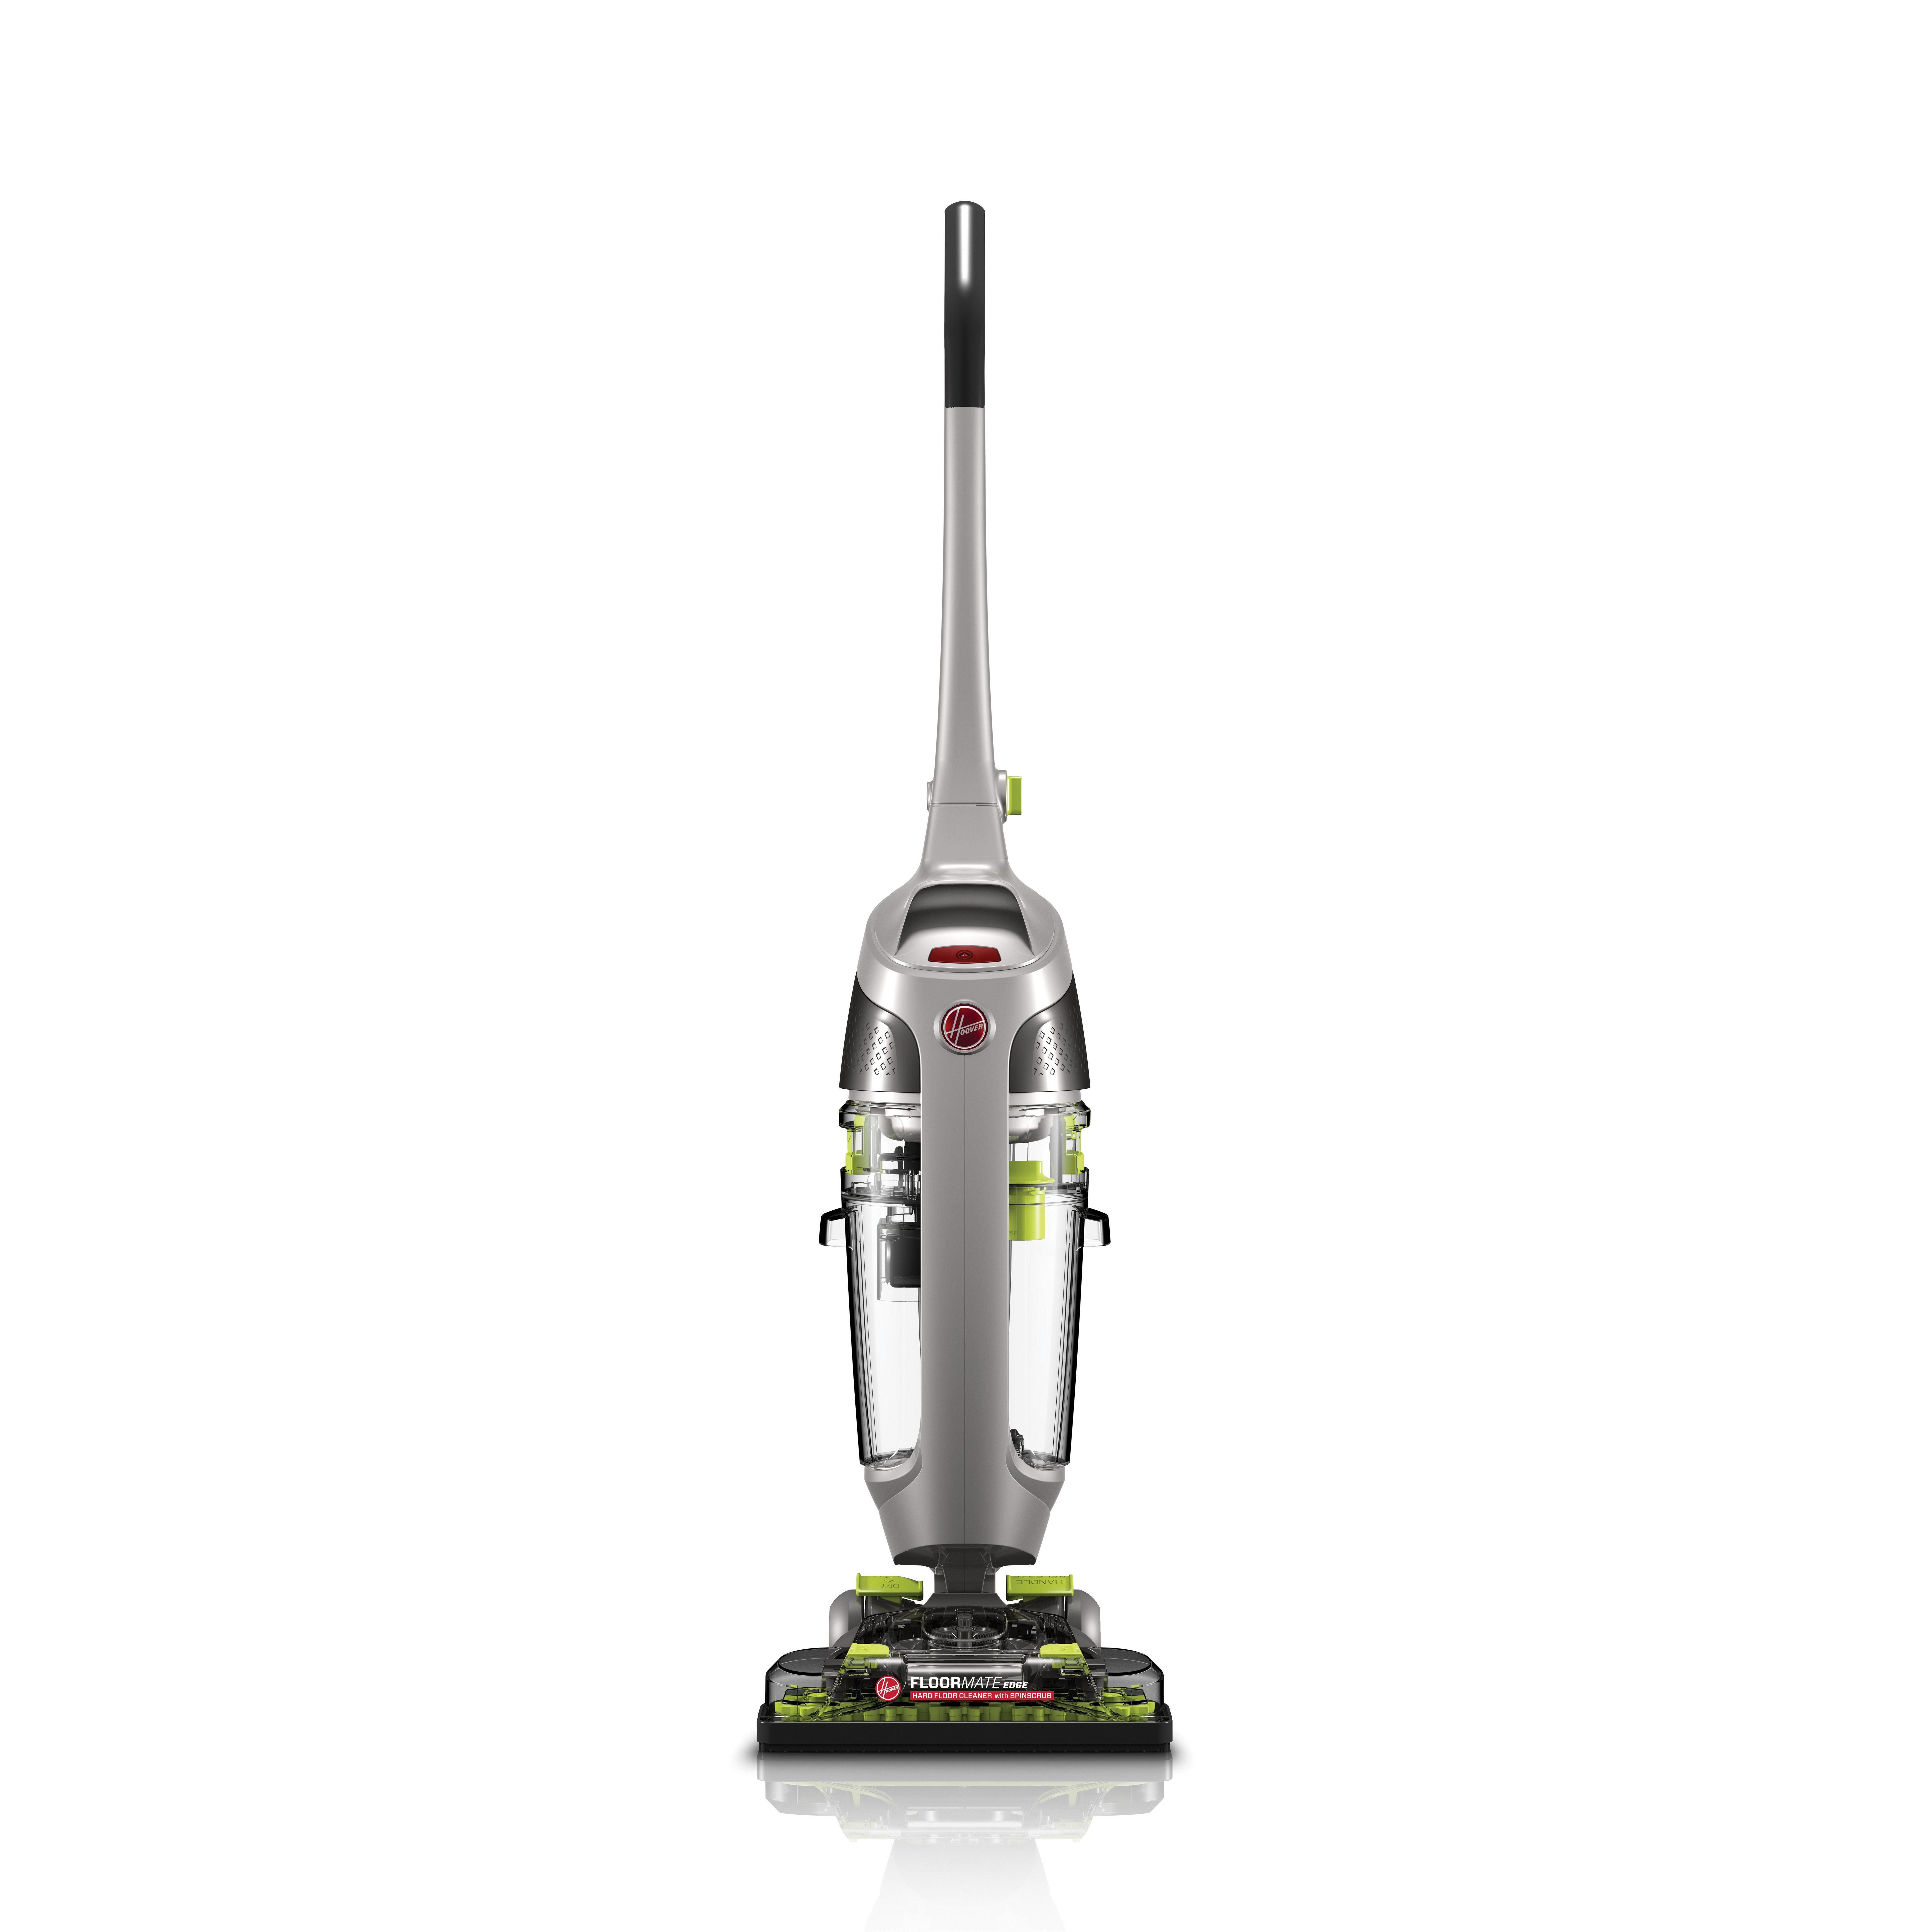 FloorMate Edge Hard Floor Cleaner